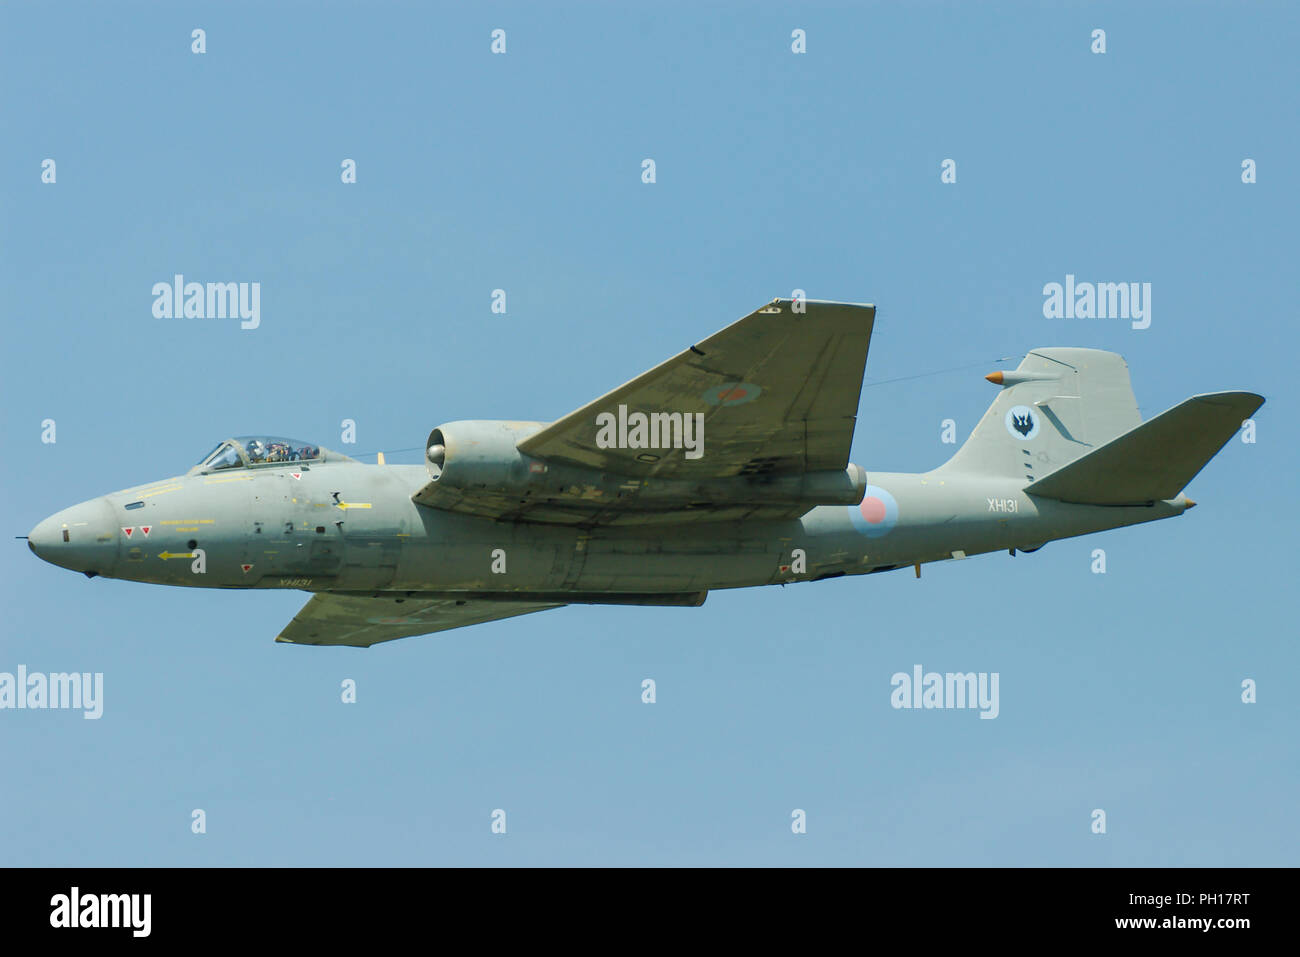 royal-air-force-raf-english-electric-canberra-pr9-vintage-classic-jet-plane-flying-in-blue-sky-shorts-built-canberra-pr9-xh131-spy-plane-photo-reconn-PH17RT.jpg